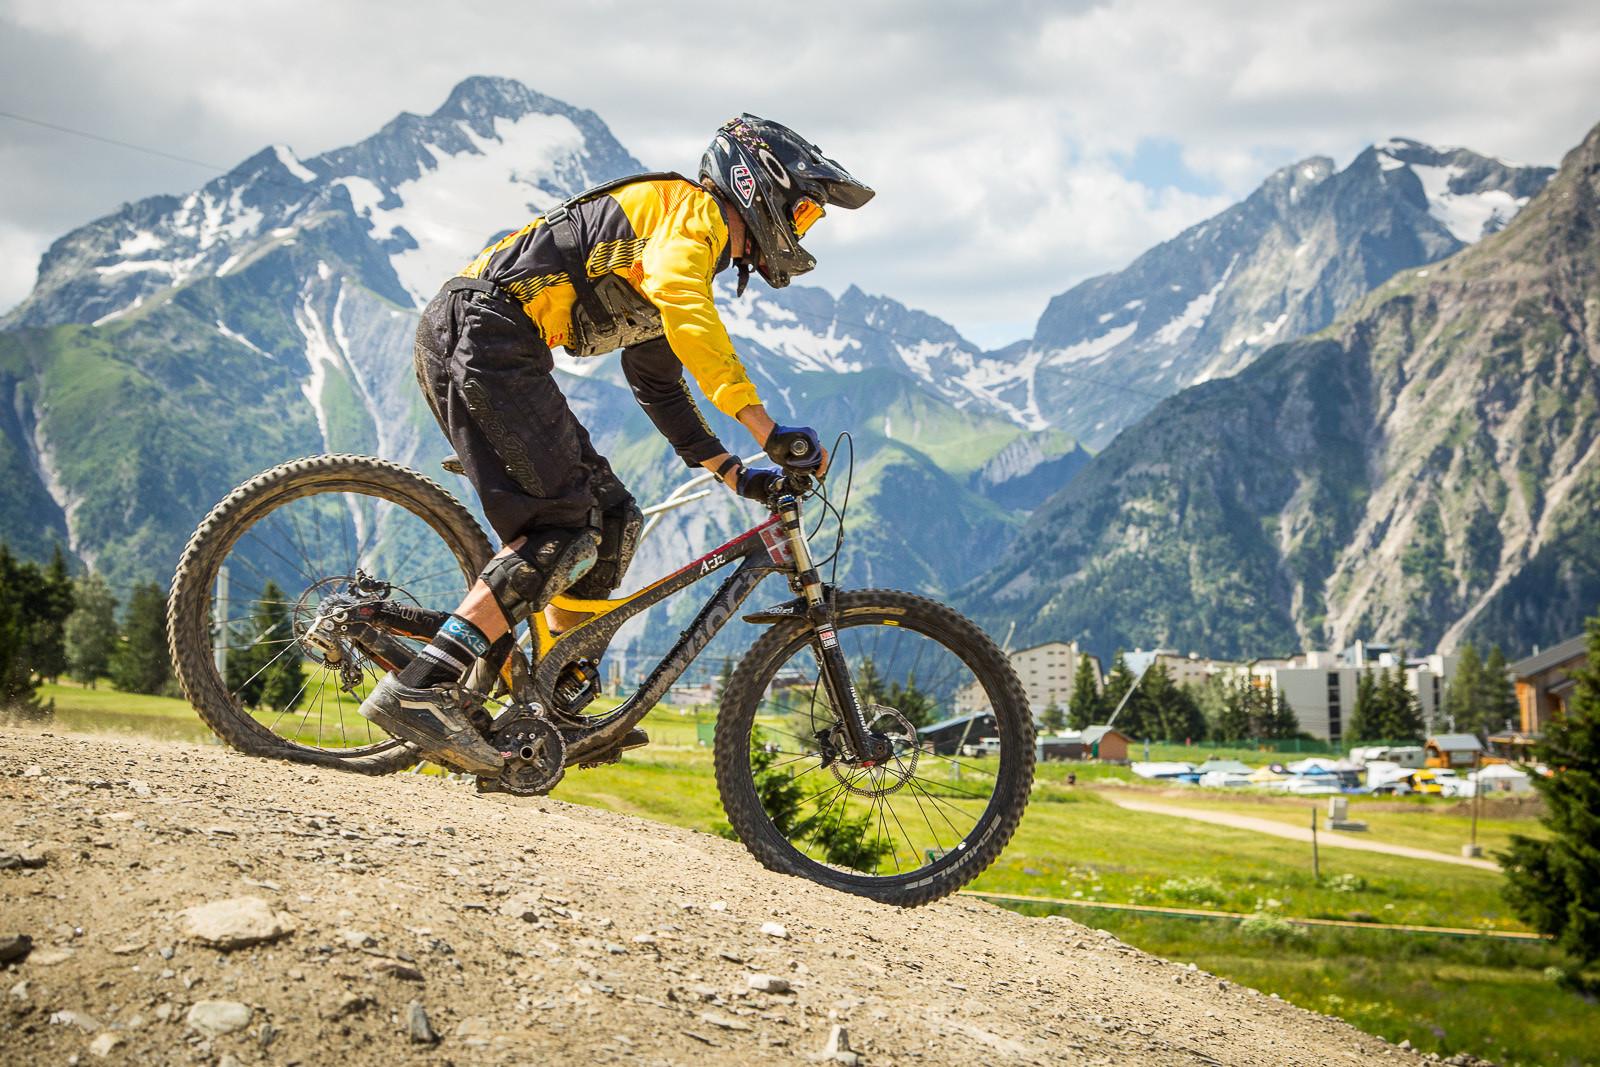 Devinci Wilson Bottom Out - G-Out Project: Crankworx L2A Air DH - Mountain Biking Pictures - Vital MTB